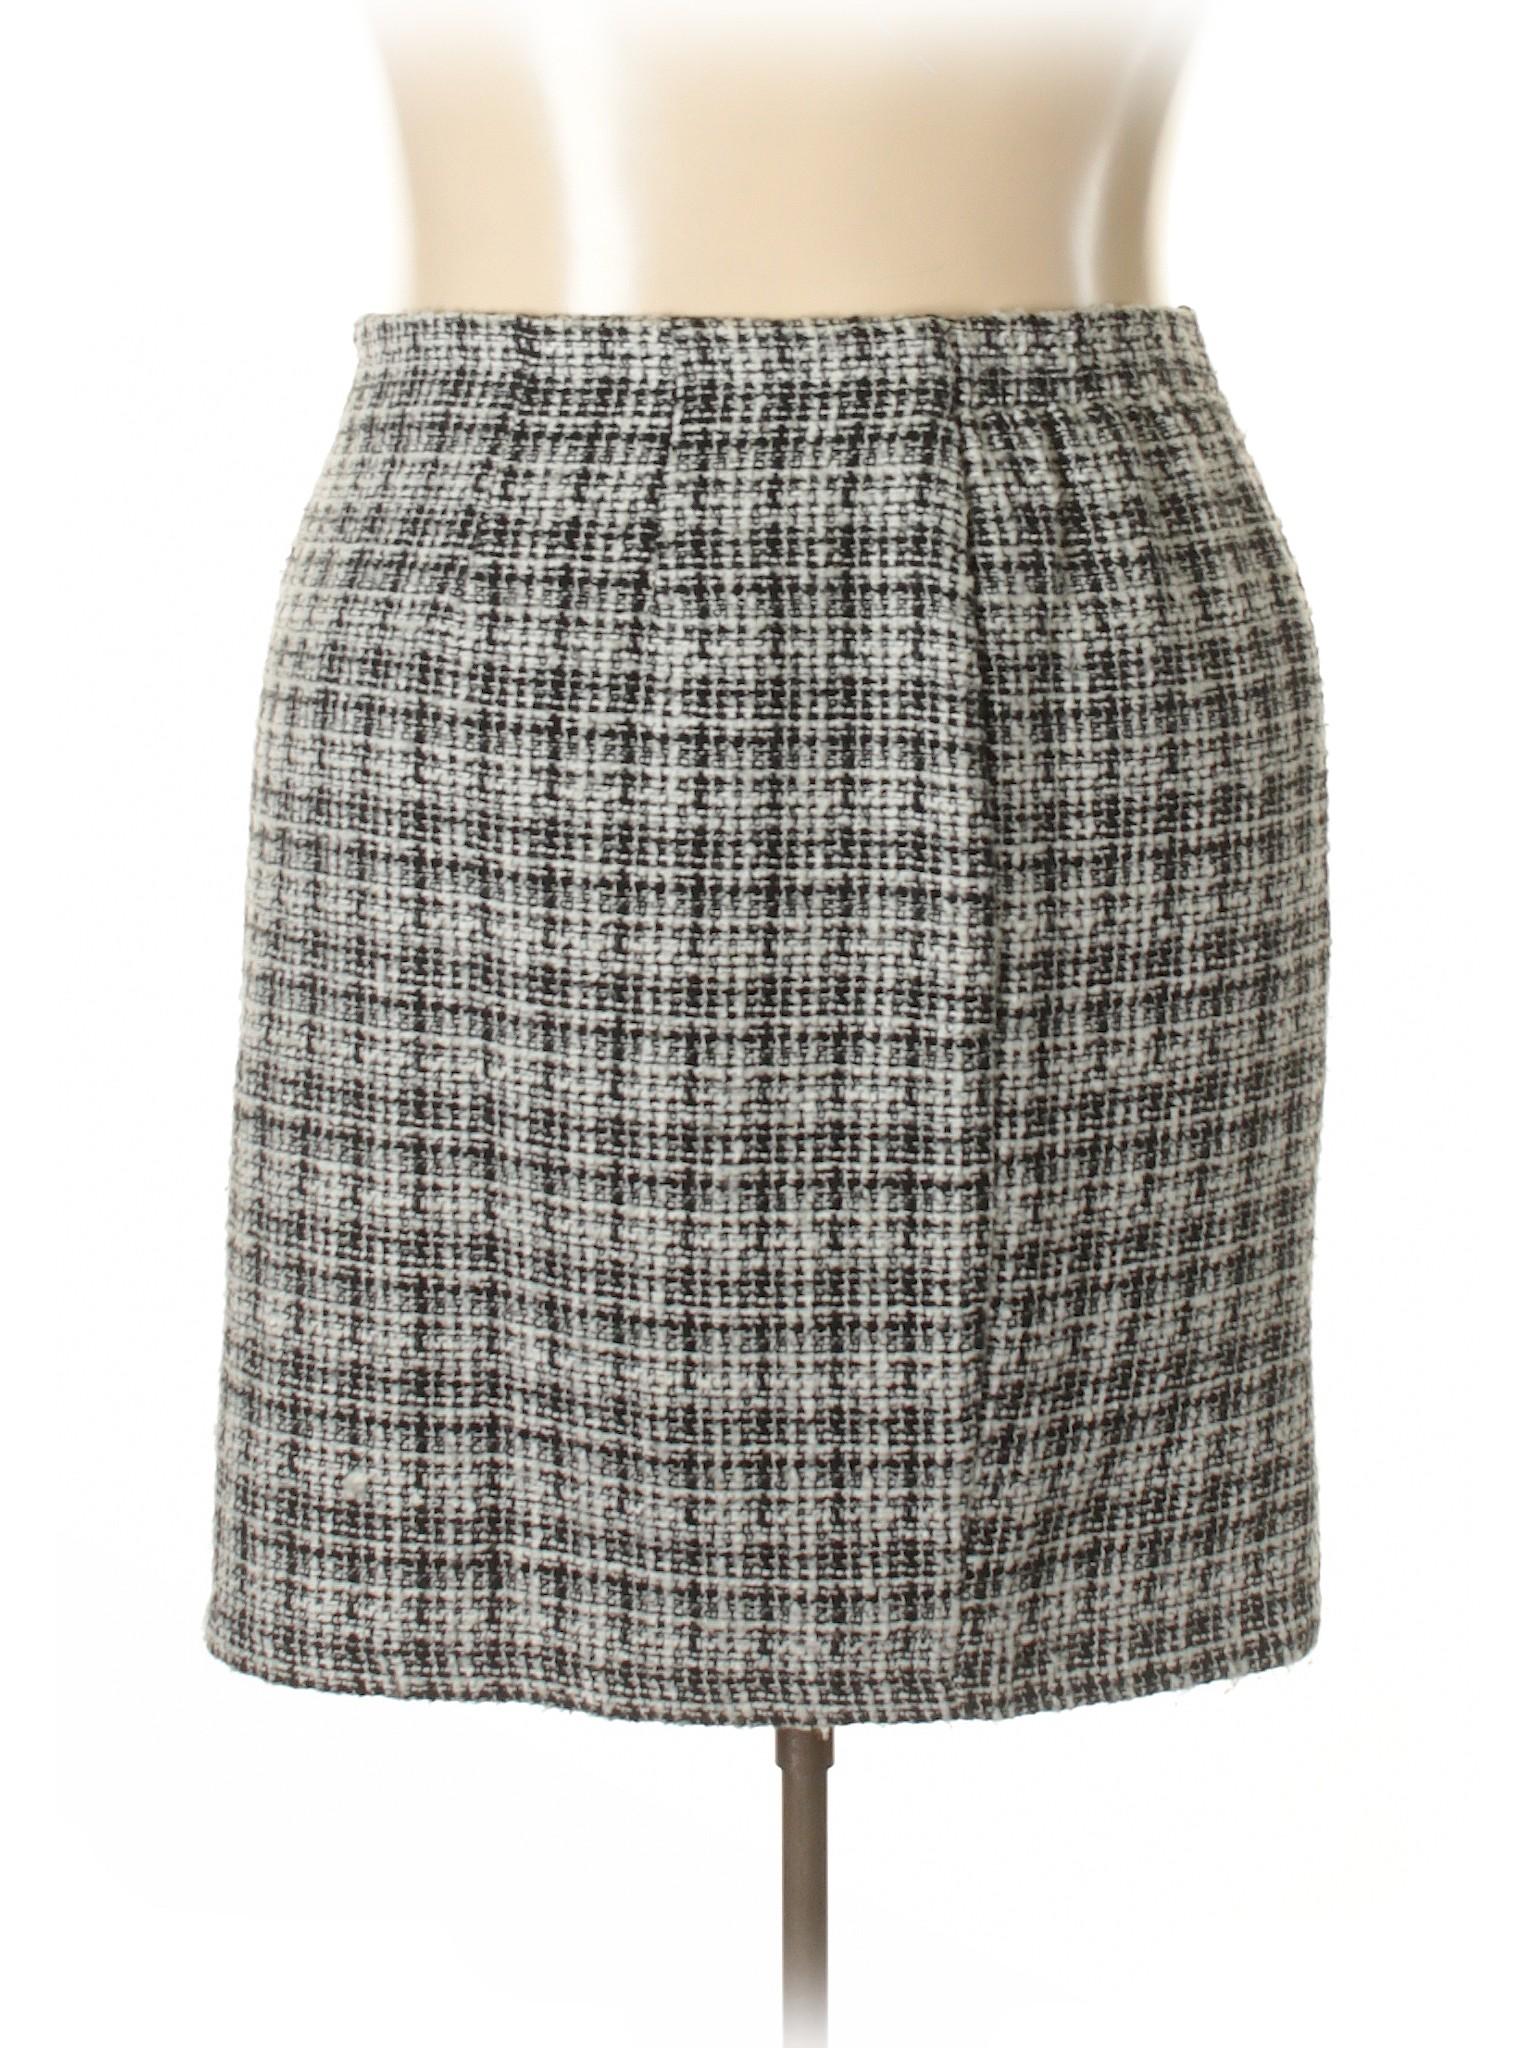 Skirt Boutique Boutique Boutique Casual Boutique Skirt Casual Casual Boutique Casual Skirt Skirt Casual Skirt ARwx8qAr